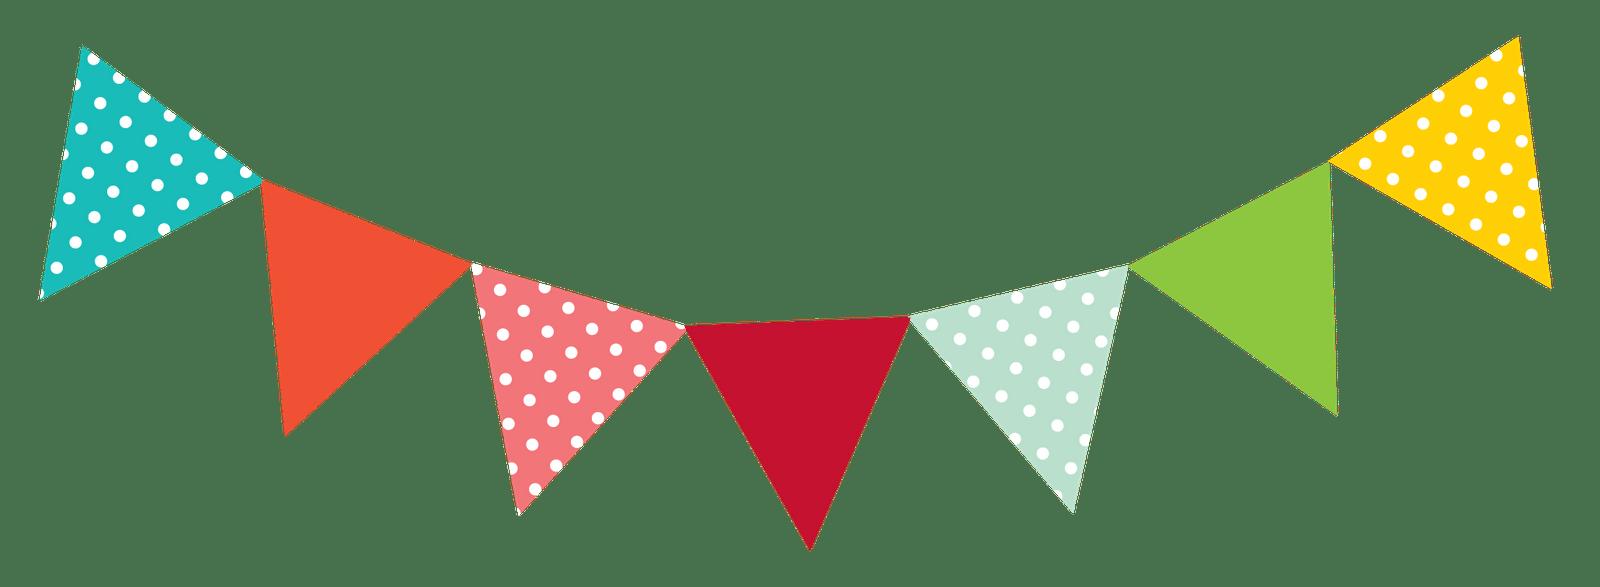 Triangular clipart pennant. American flag in triangle